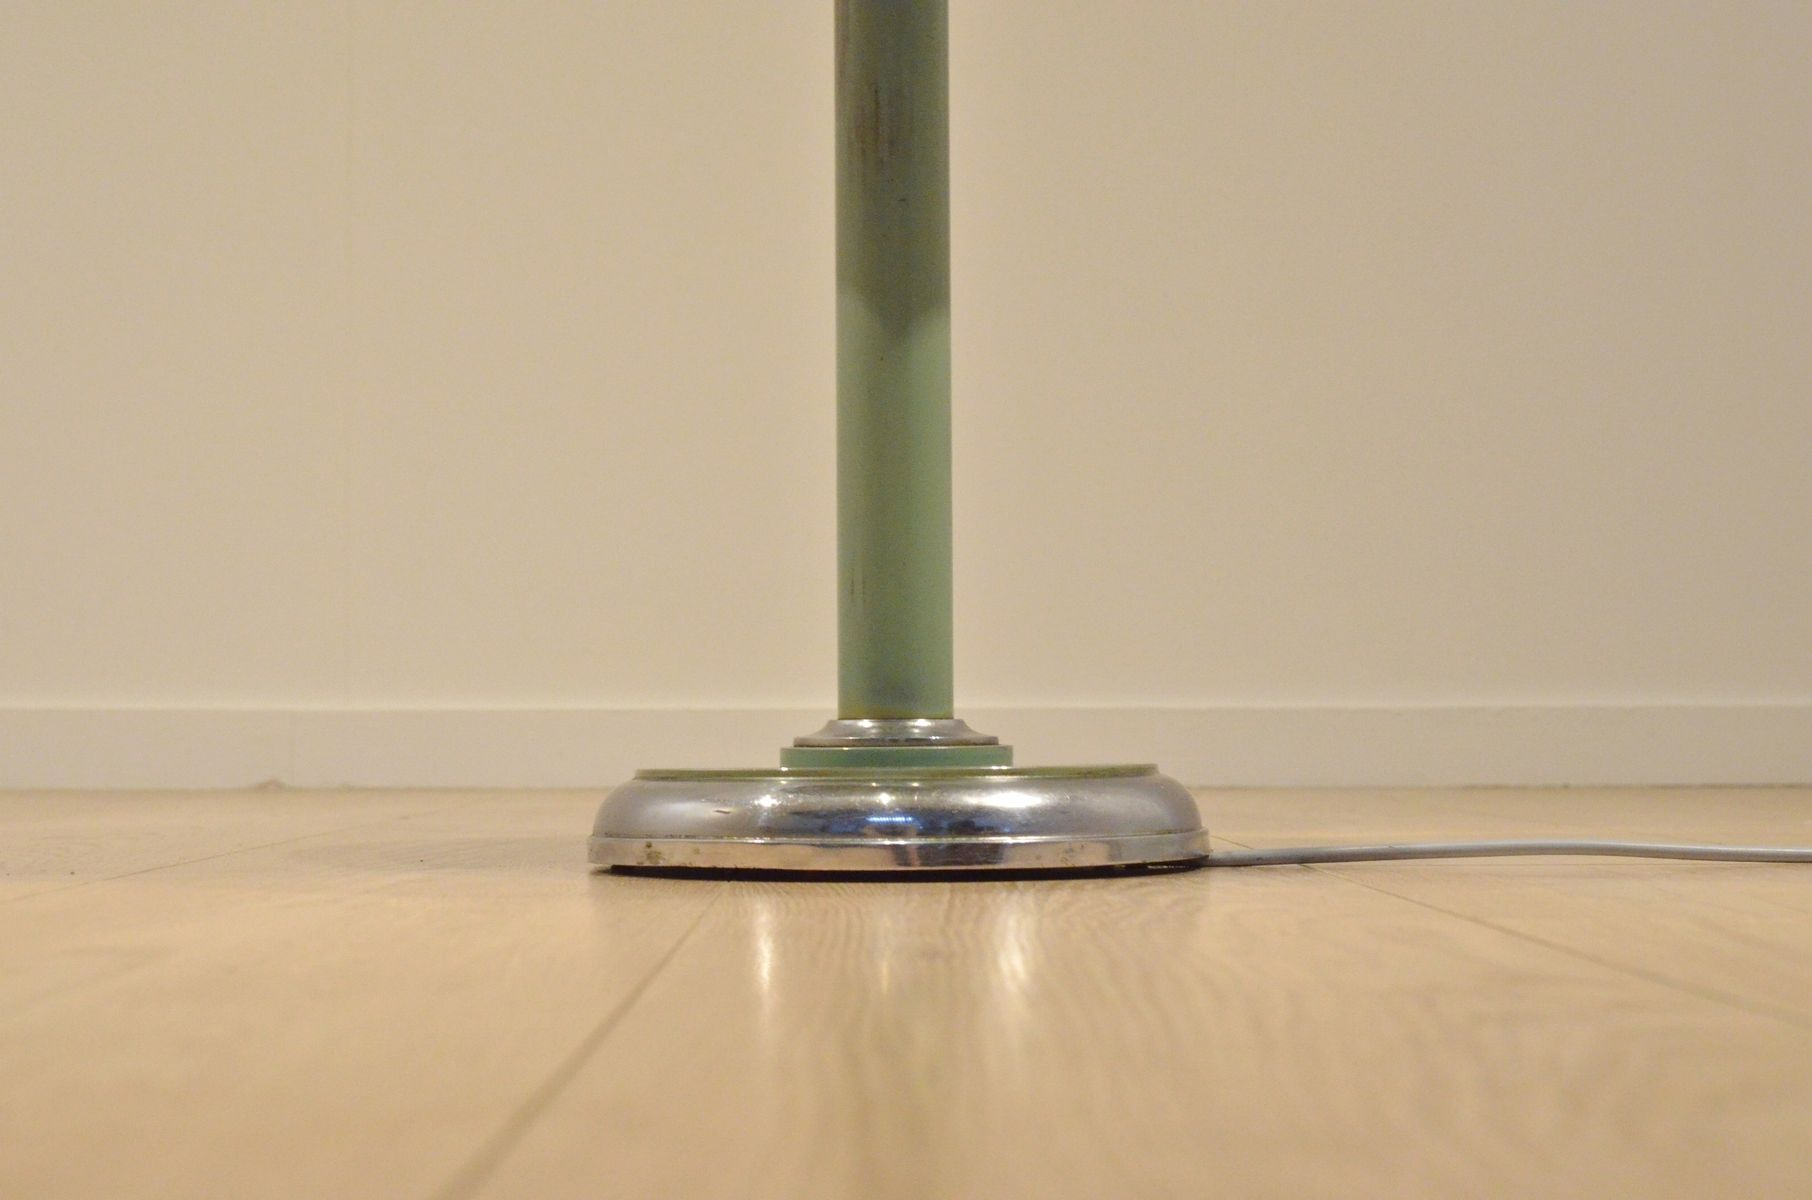 verstellbare vintage stehlampe mit ablage im bauhaus stil. Black Bedroom Furniture Sets. Home Design Ideas